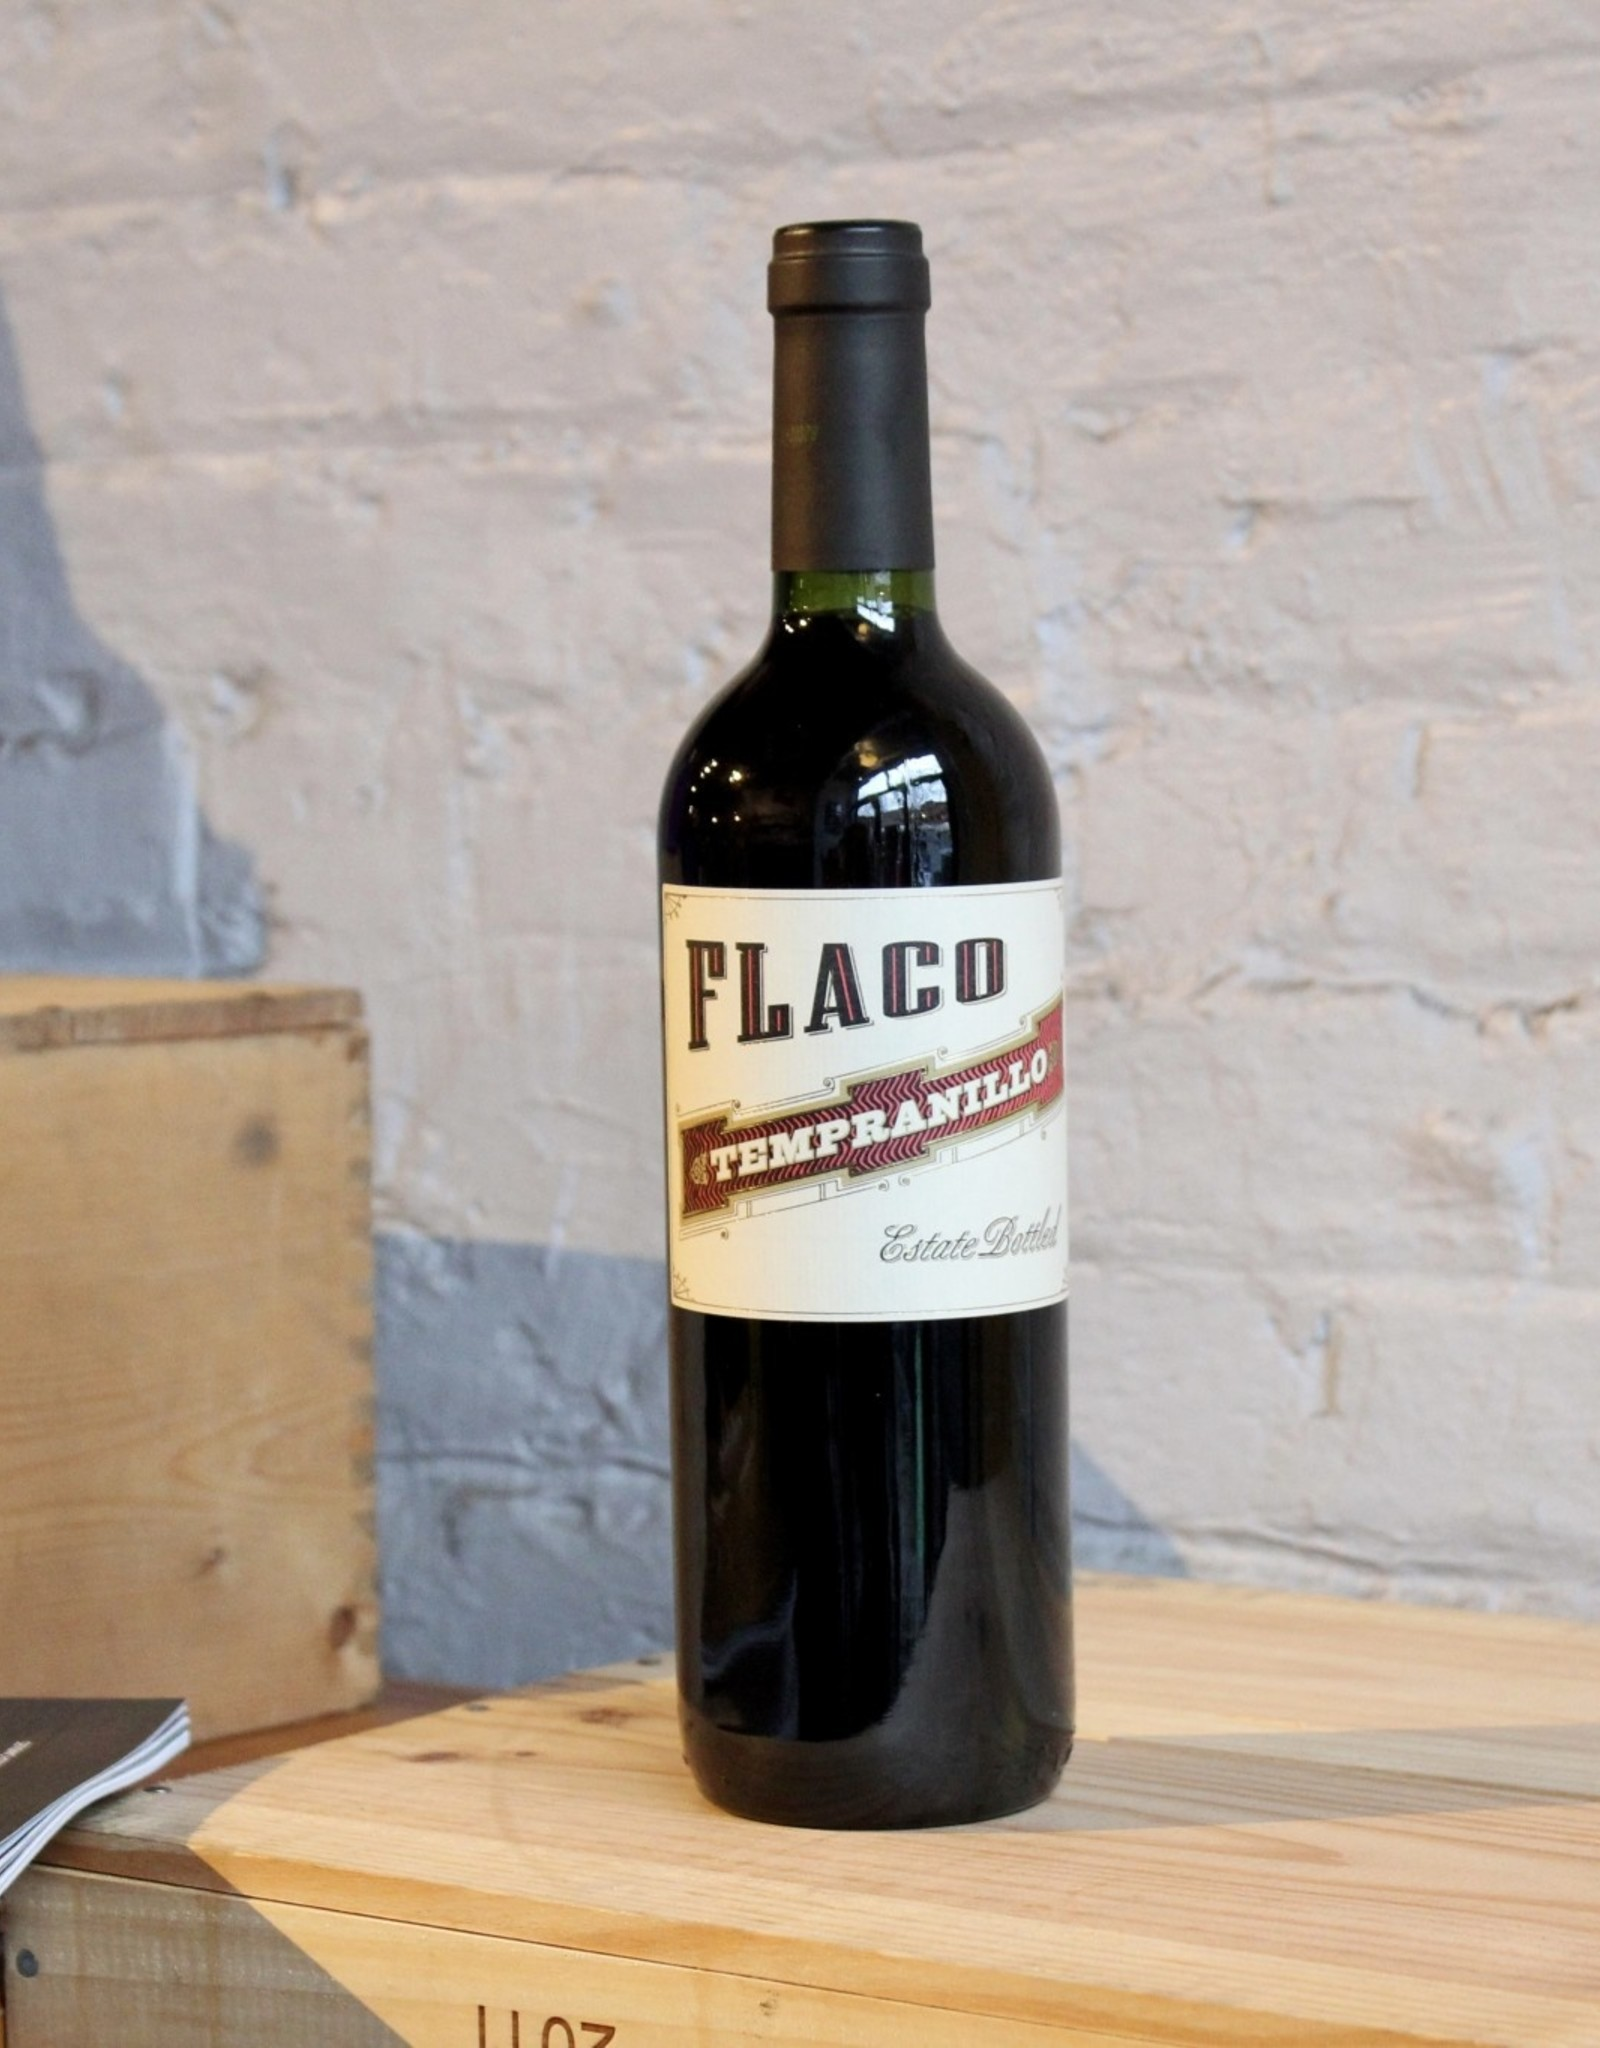 Wine 2019 Bodegas Flaco Tempranillo - Madrid, Spain (750ml)